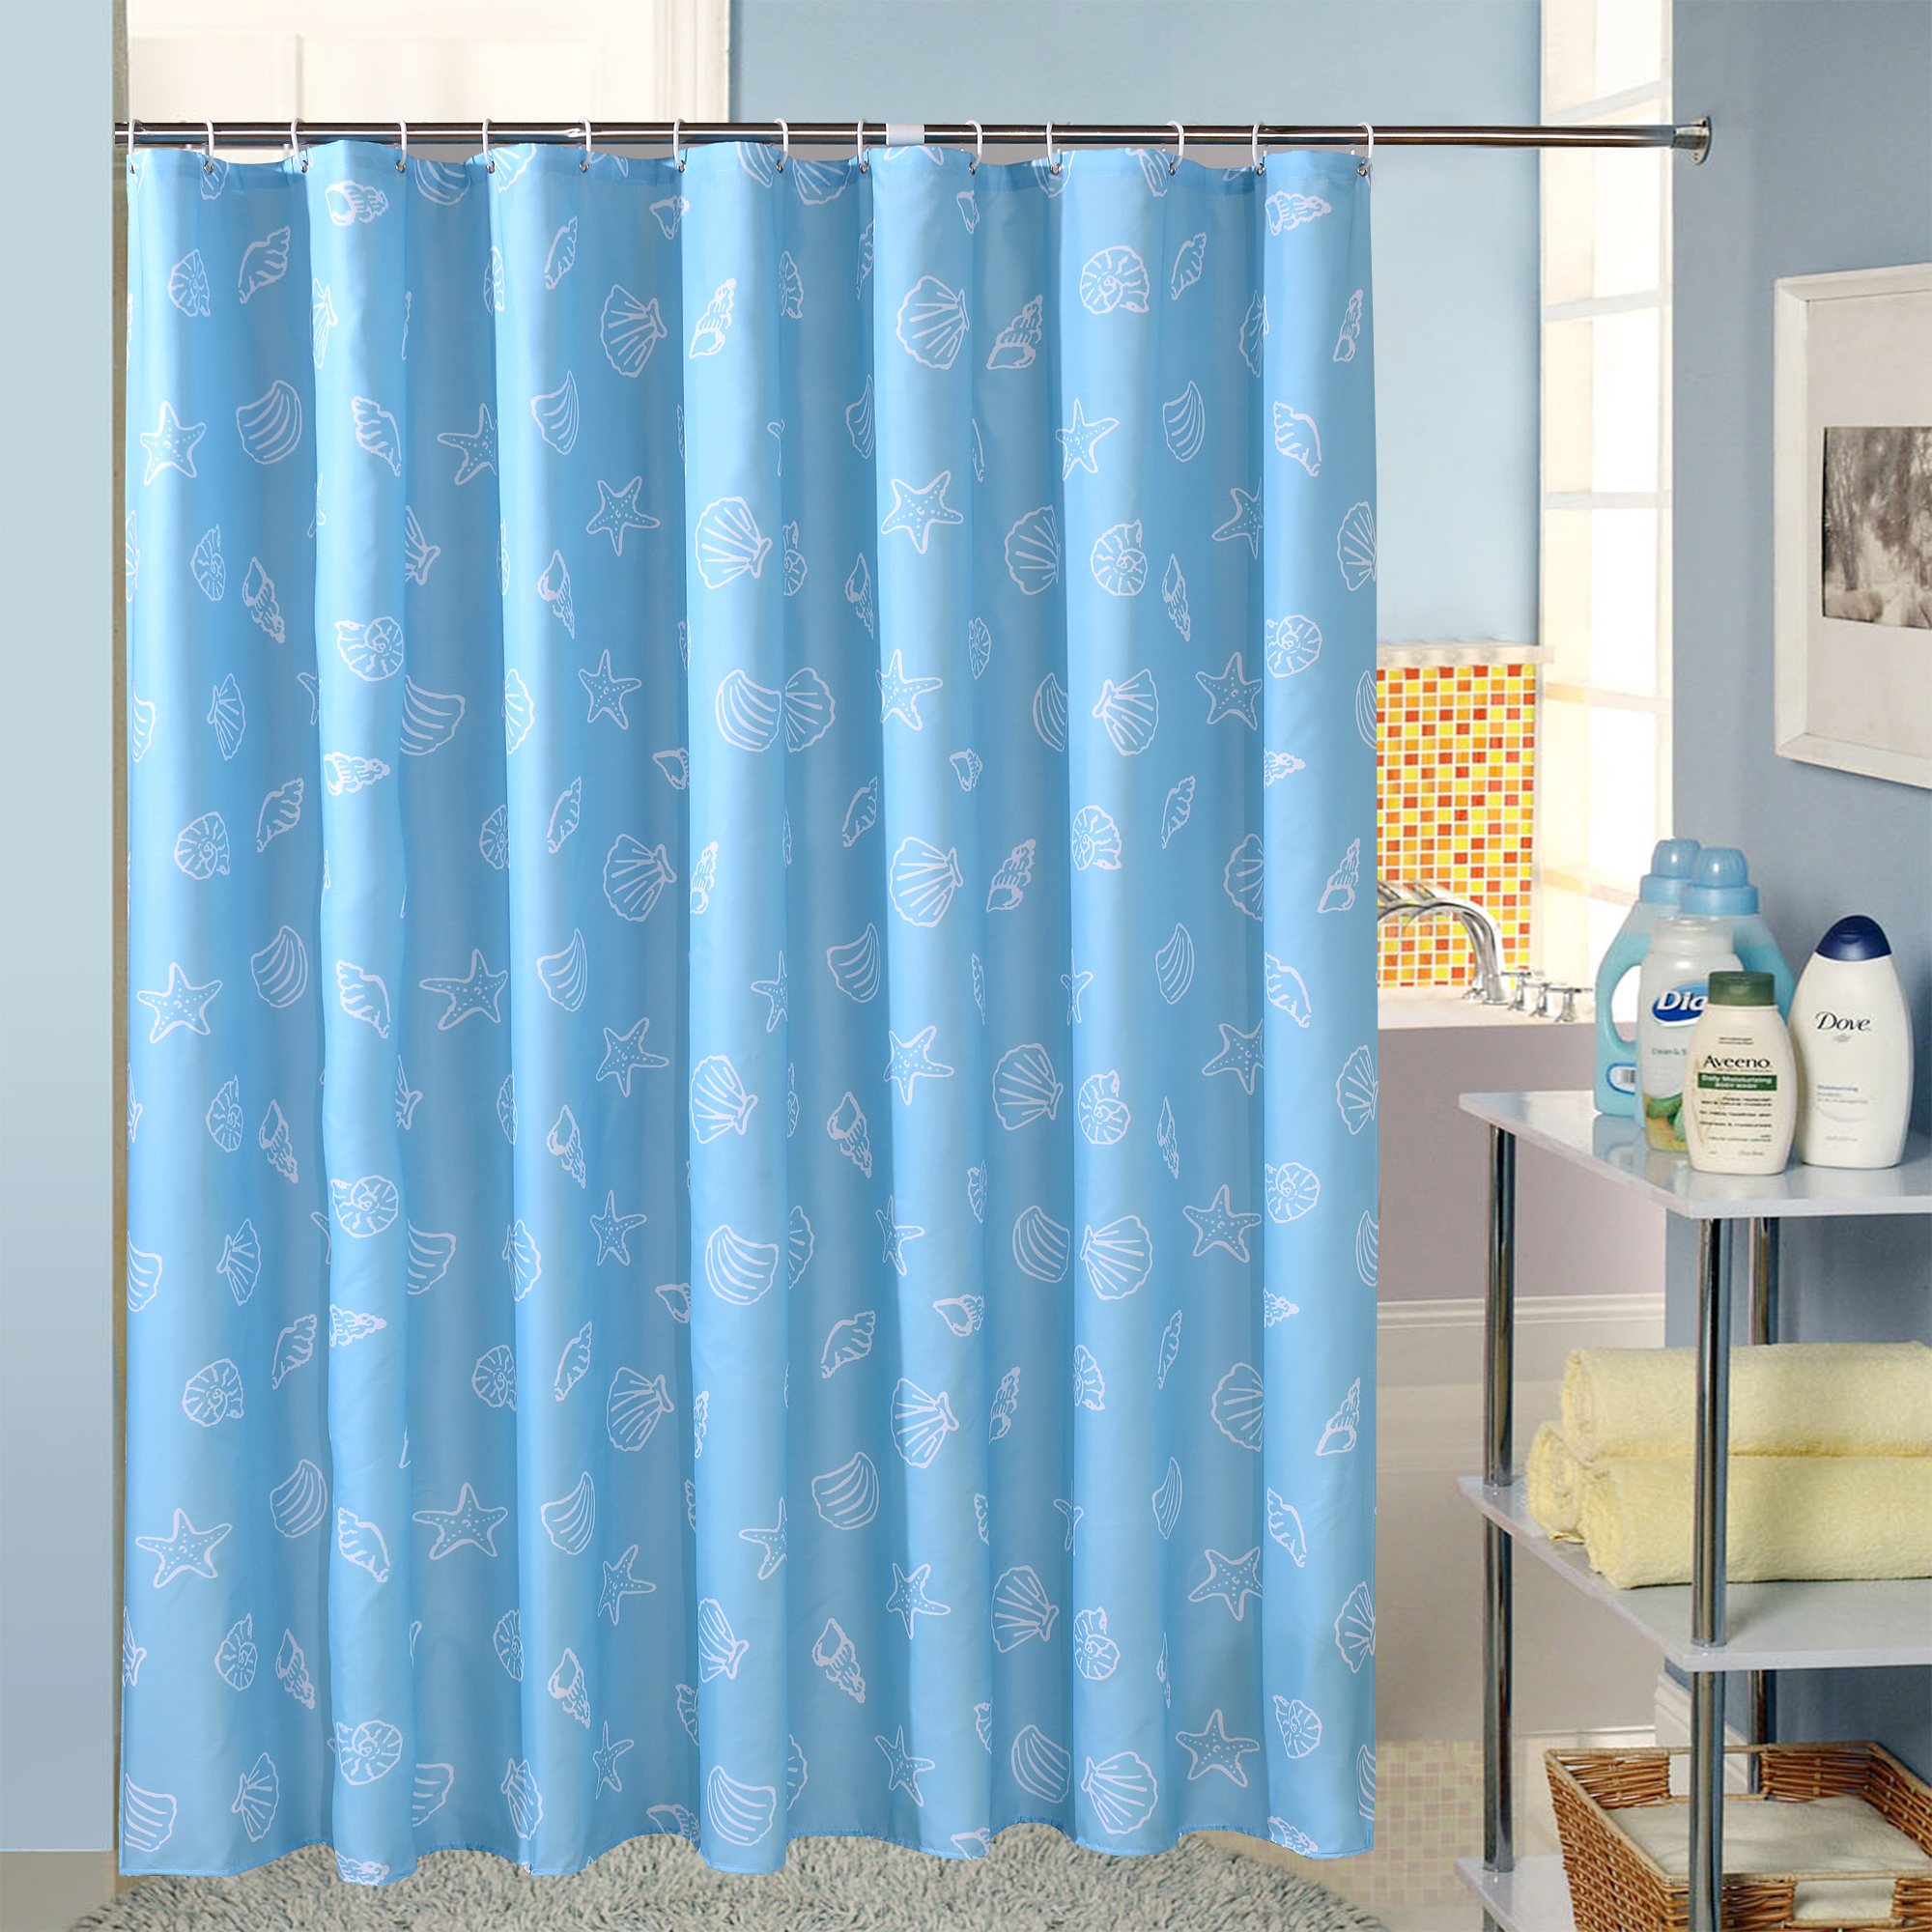 Plum curtains - Plum And Blue Curtains Plum Colored Shower Curtains Sylve